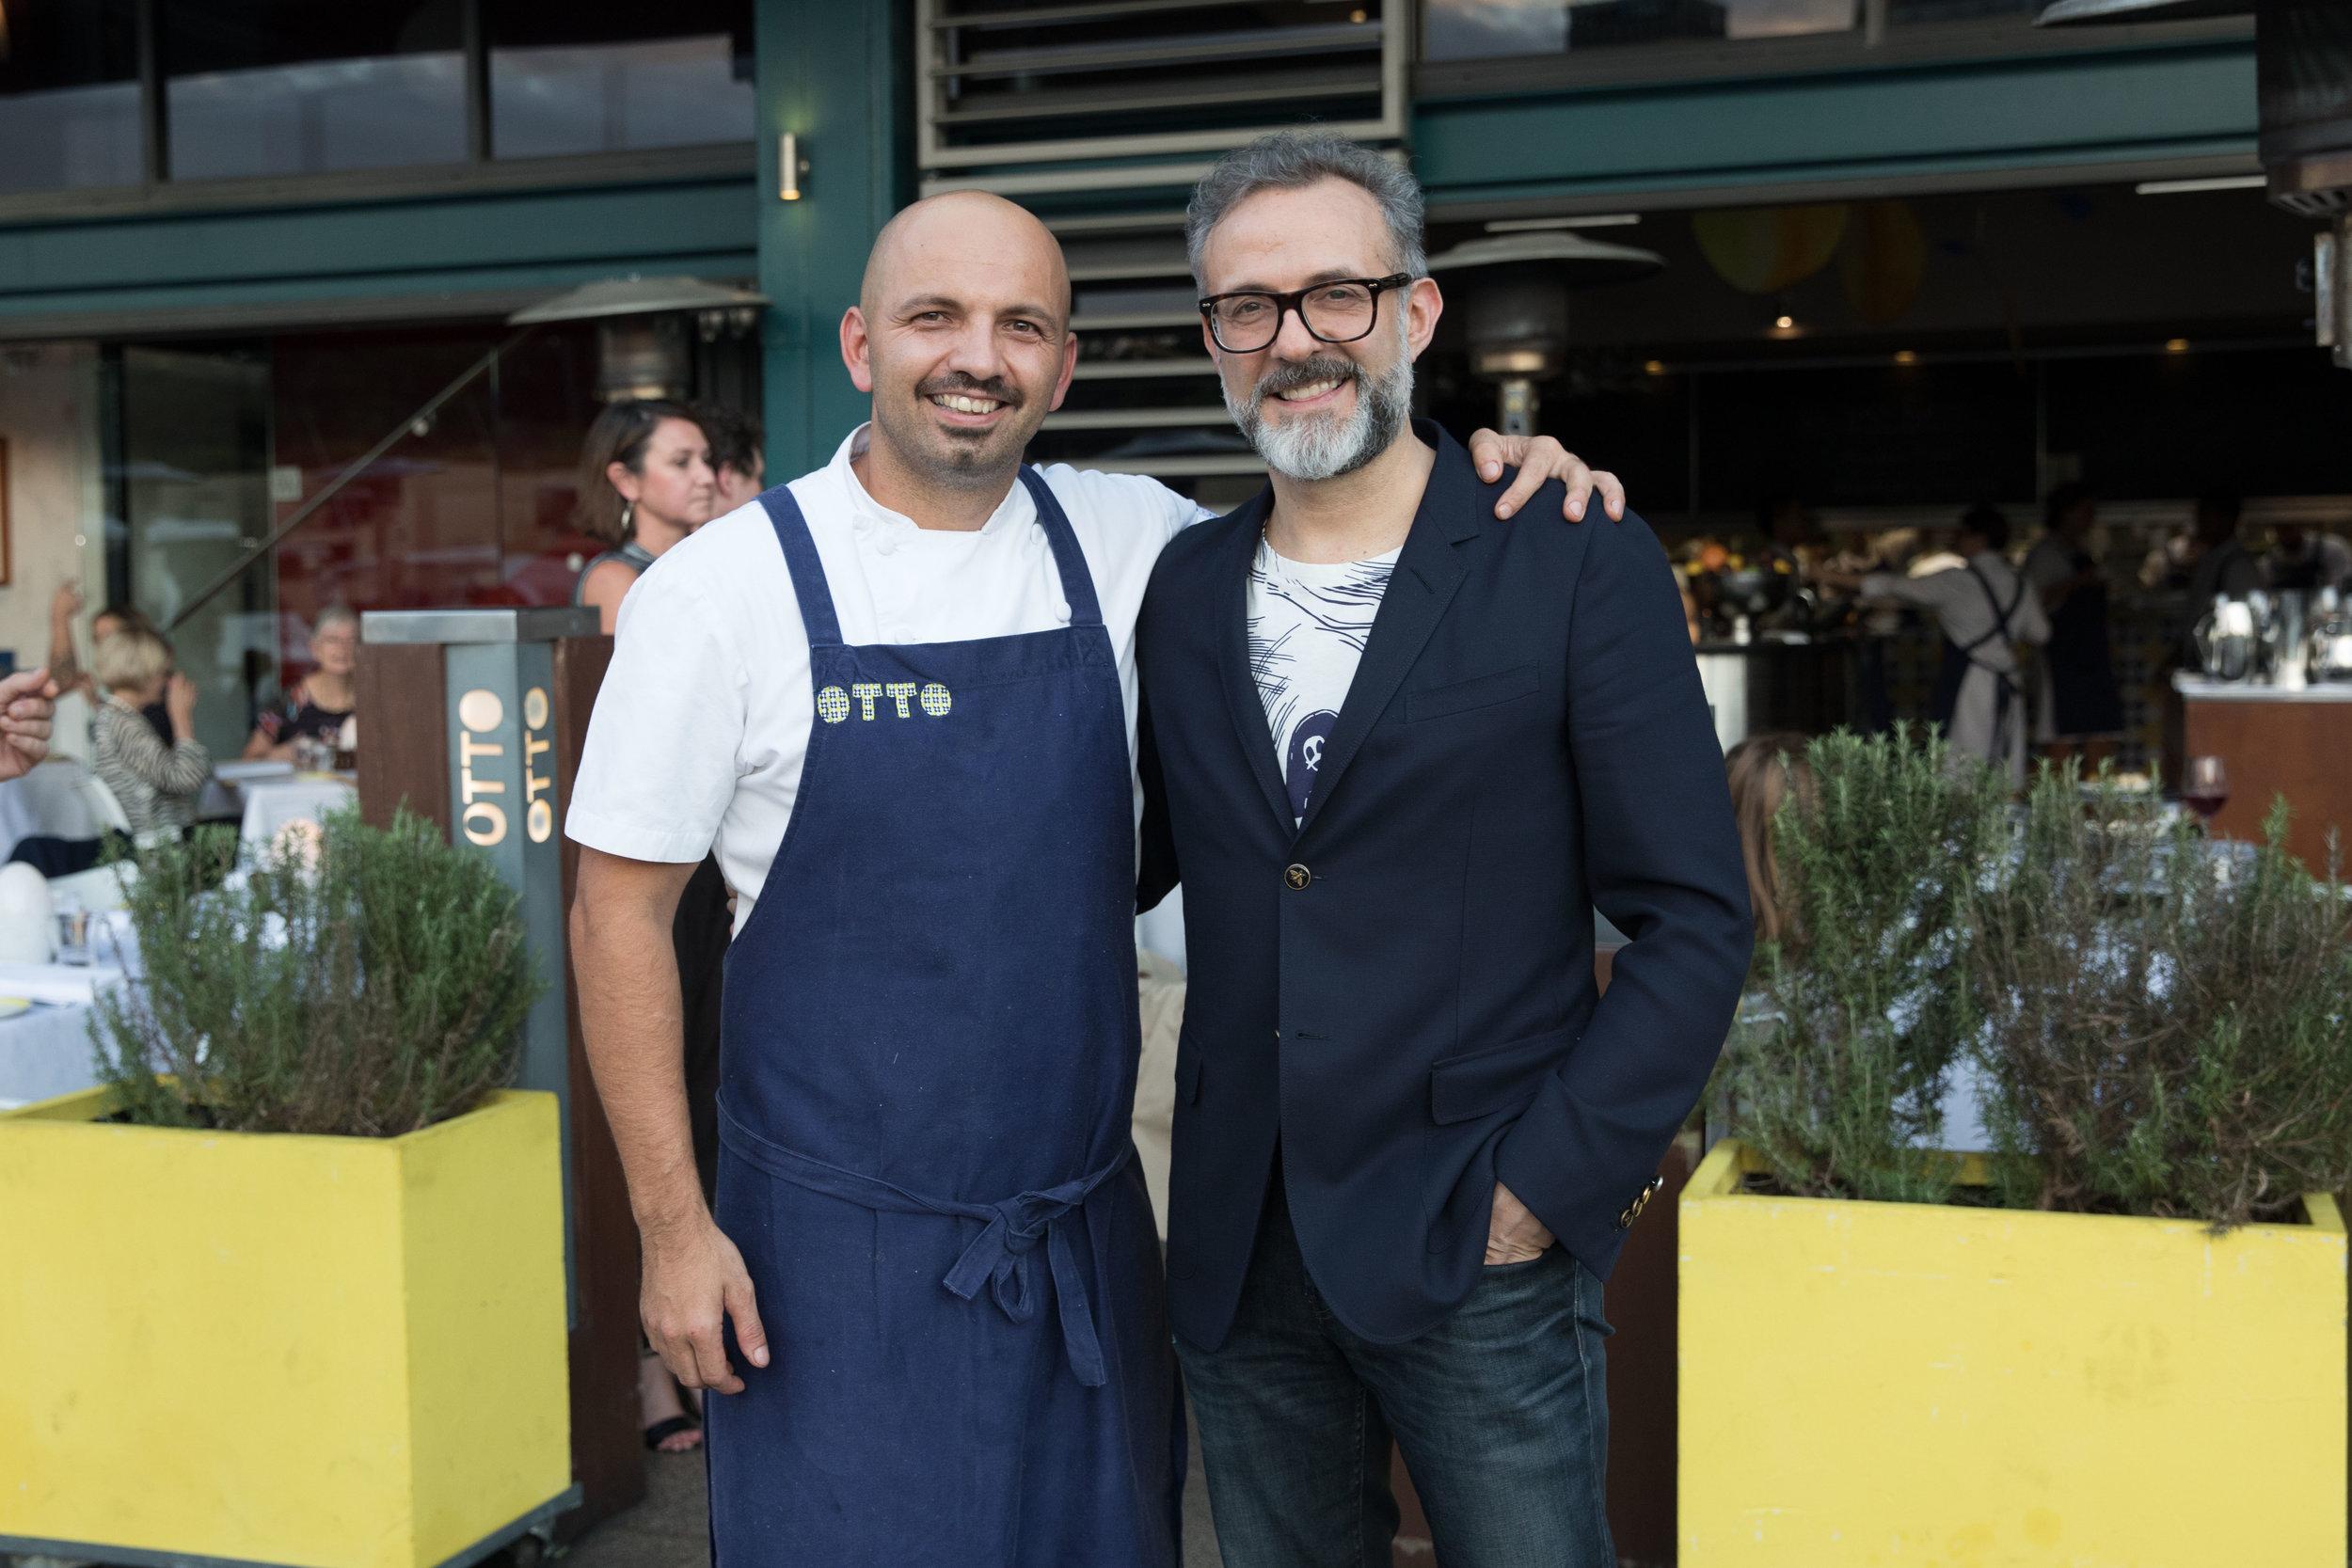 lavazza-massimo-bottura-worlds-50-best-restaurants-awards-2017-chef-otto.jpg